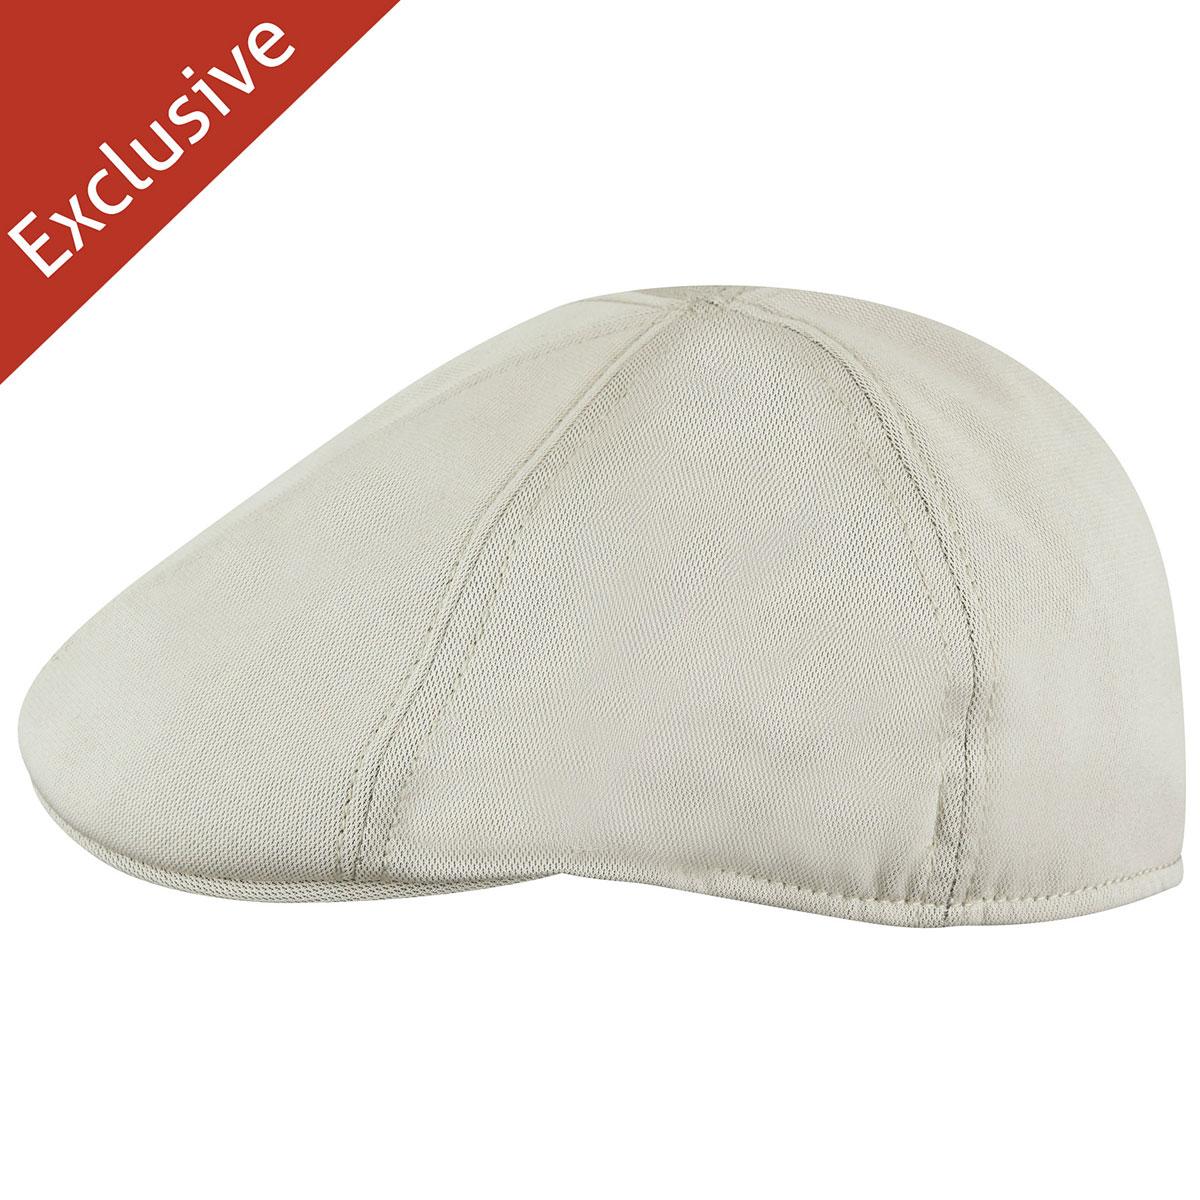 Hats.com Boris Flex Bamboo Cap in Stone